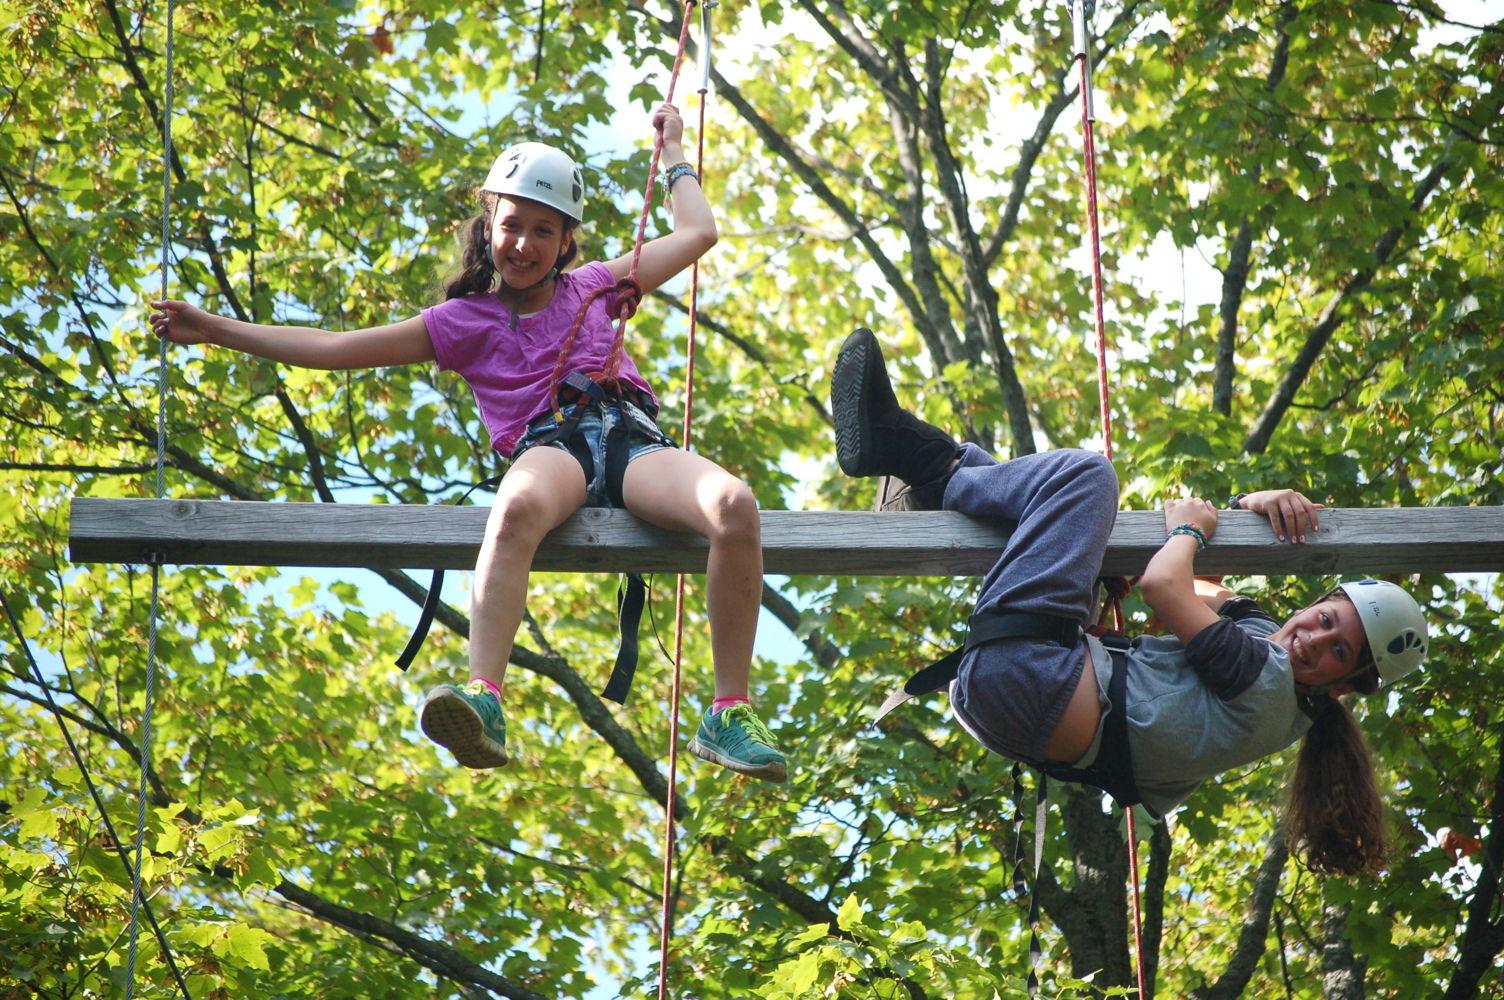 Climbing / Ropes